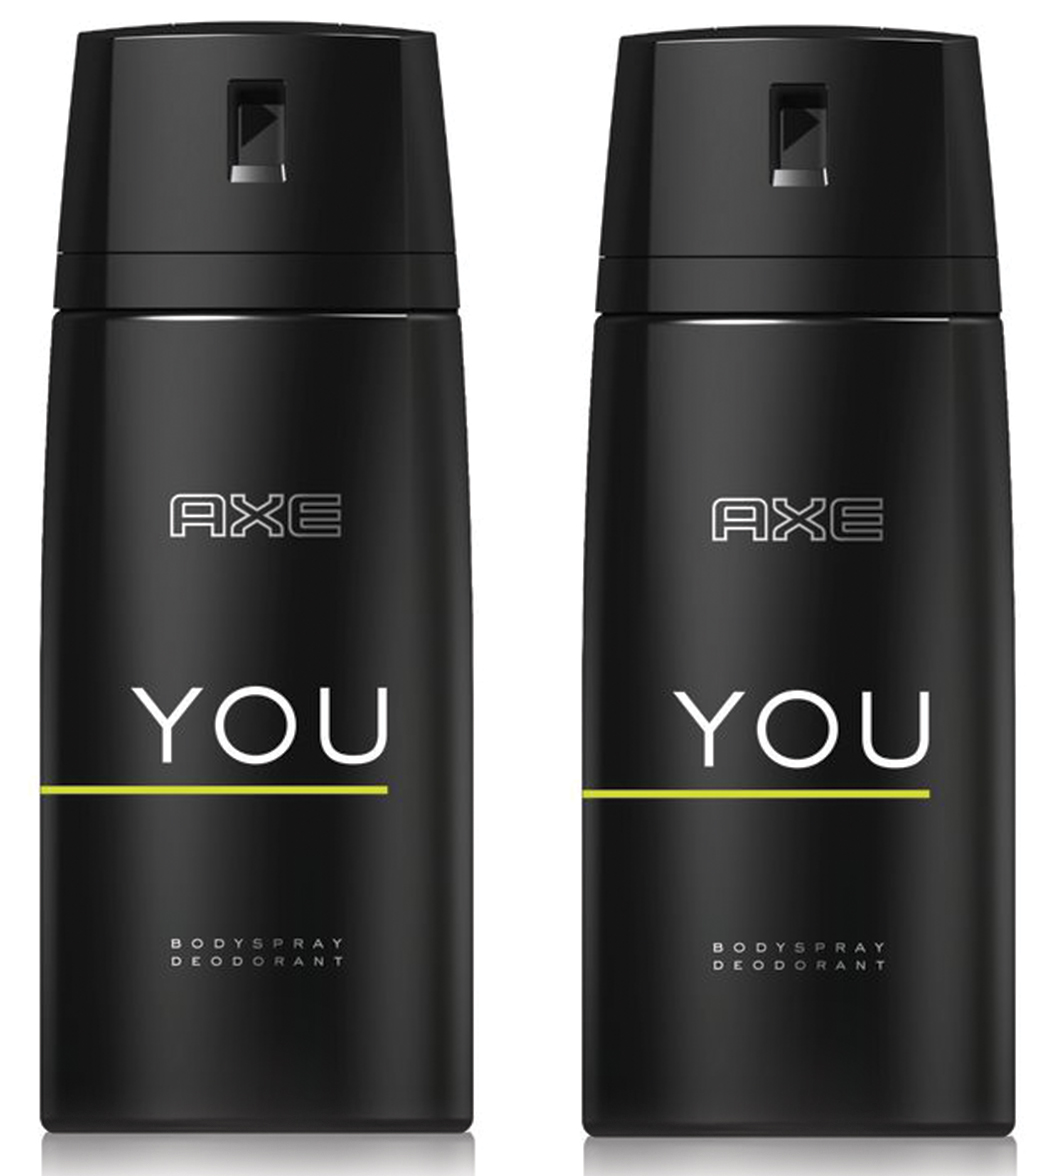 Axe Πακέτο Προσφοράς You Body Spray Αποσμητικό 2x150ml 1+1 Δώρο